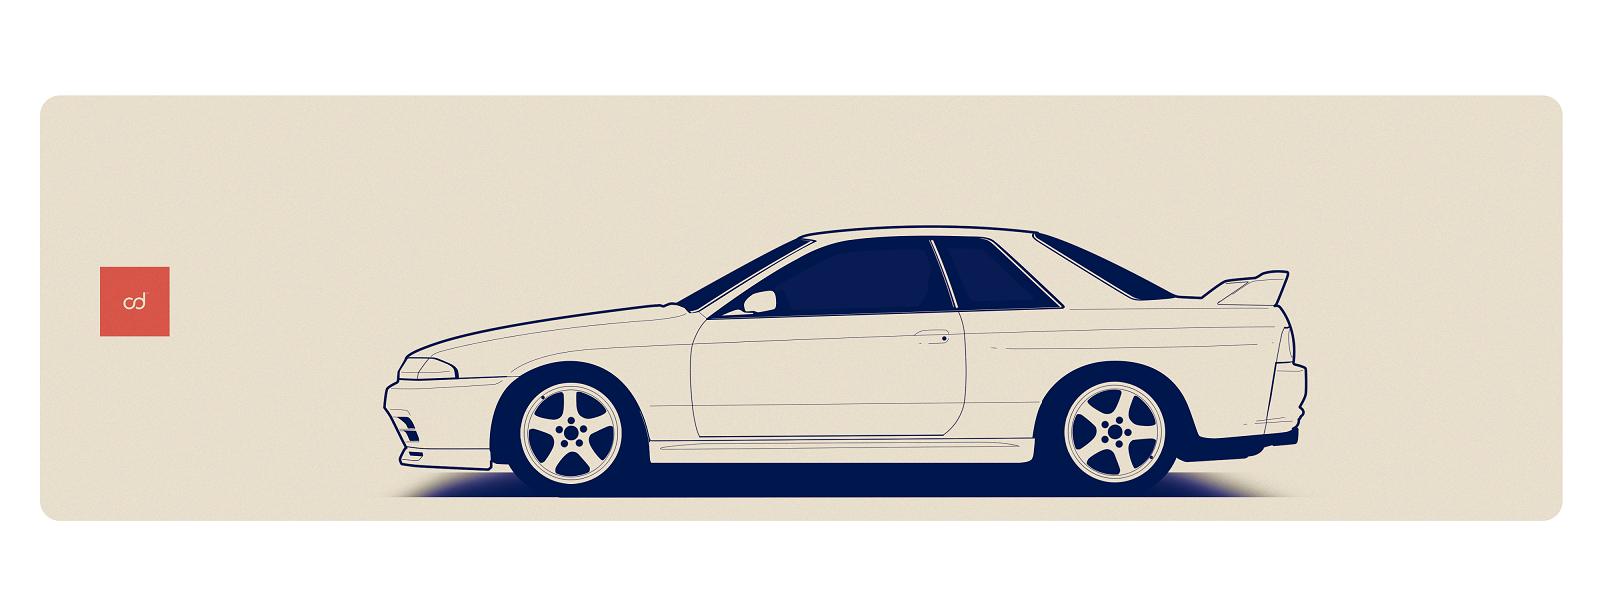 Nissan Skyline Favourites By Jeffdesign On Deviantart